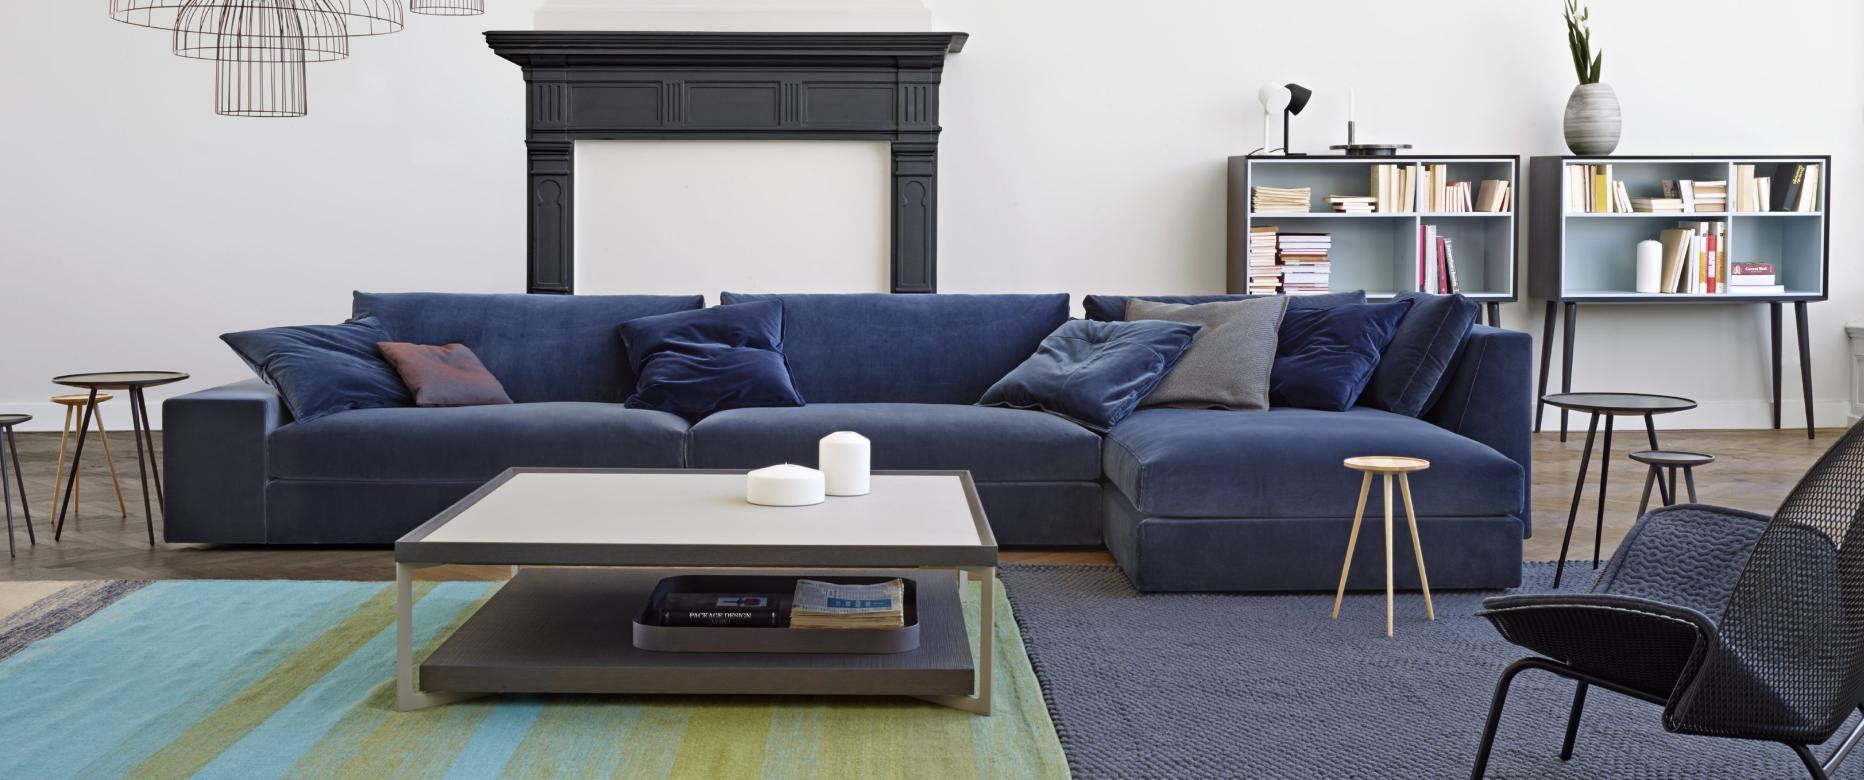 Ligne roset contemporary high end furniture for Bedroom furniture philippines 6